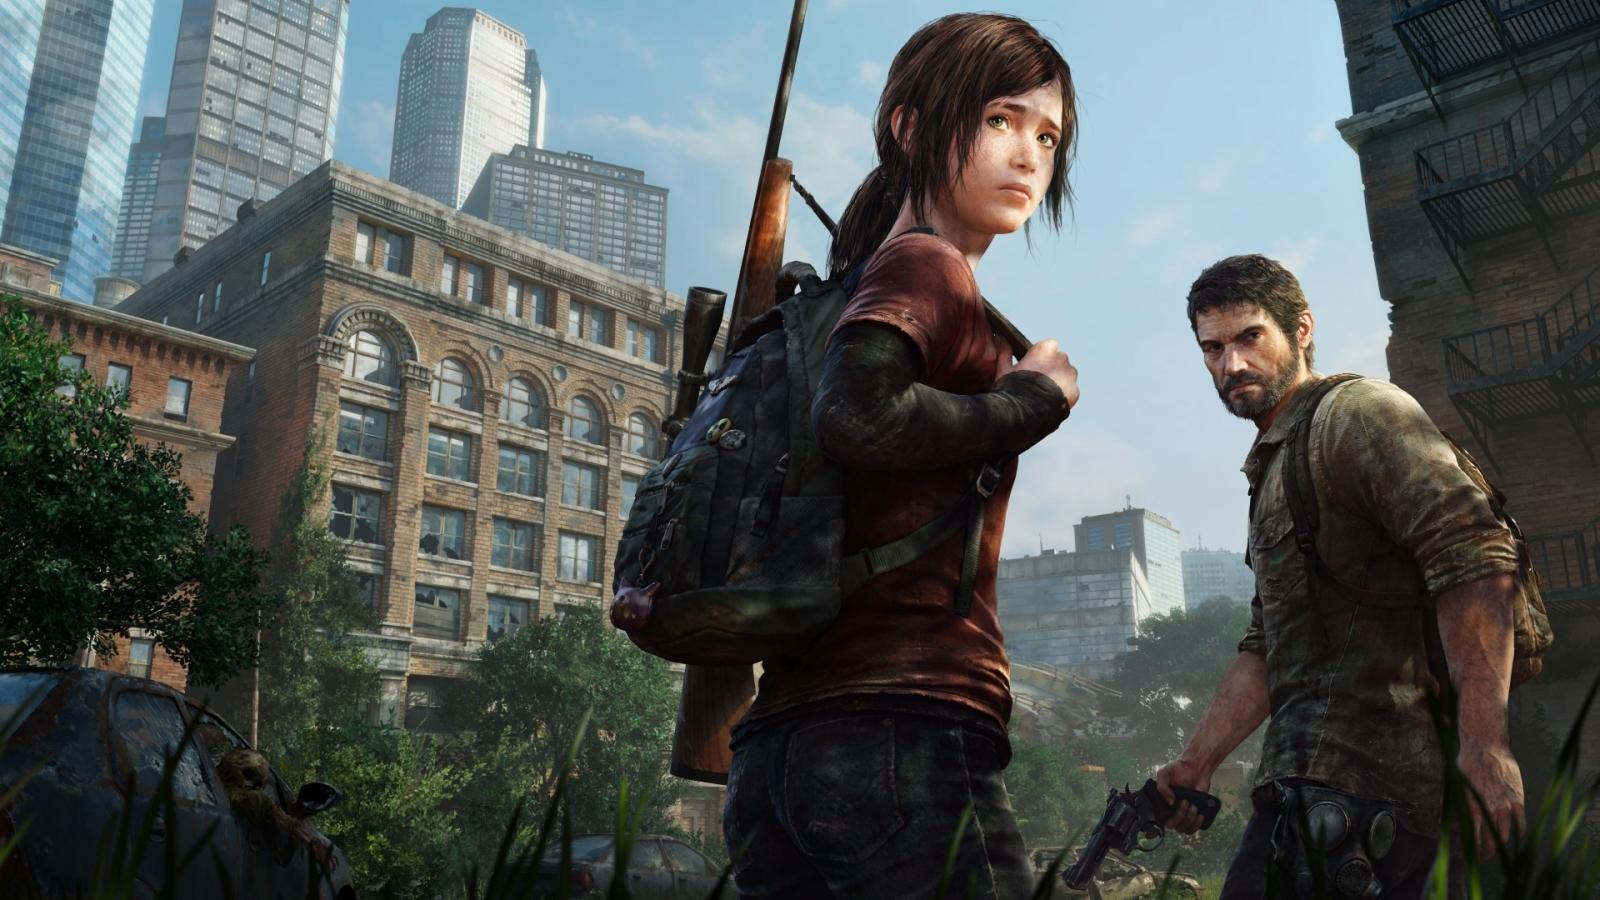 Как в интернете отреагировали на каст сериала по The Last of Us